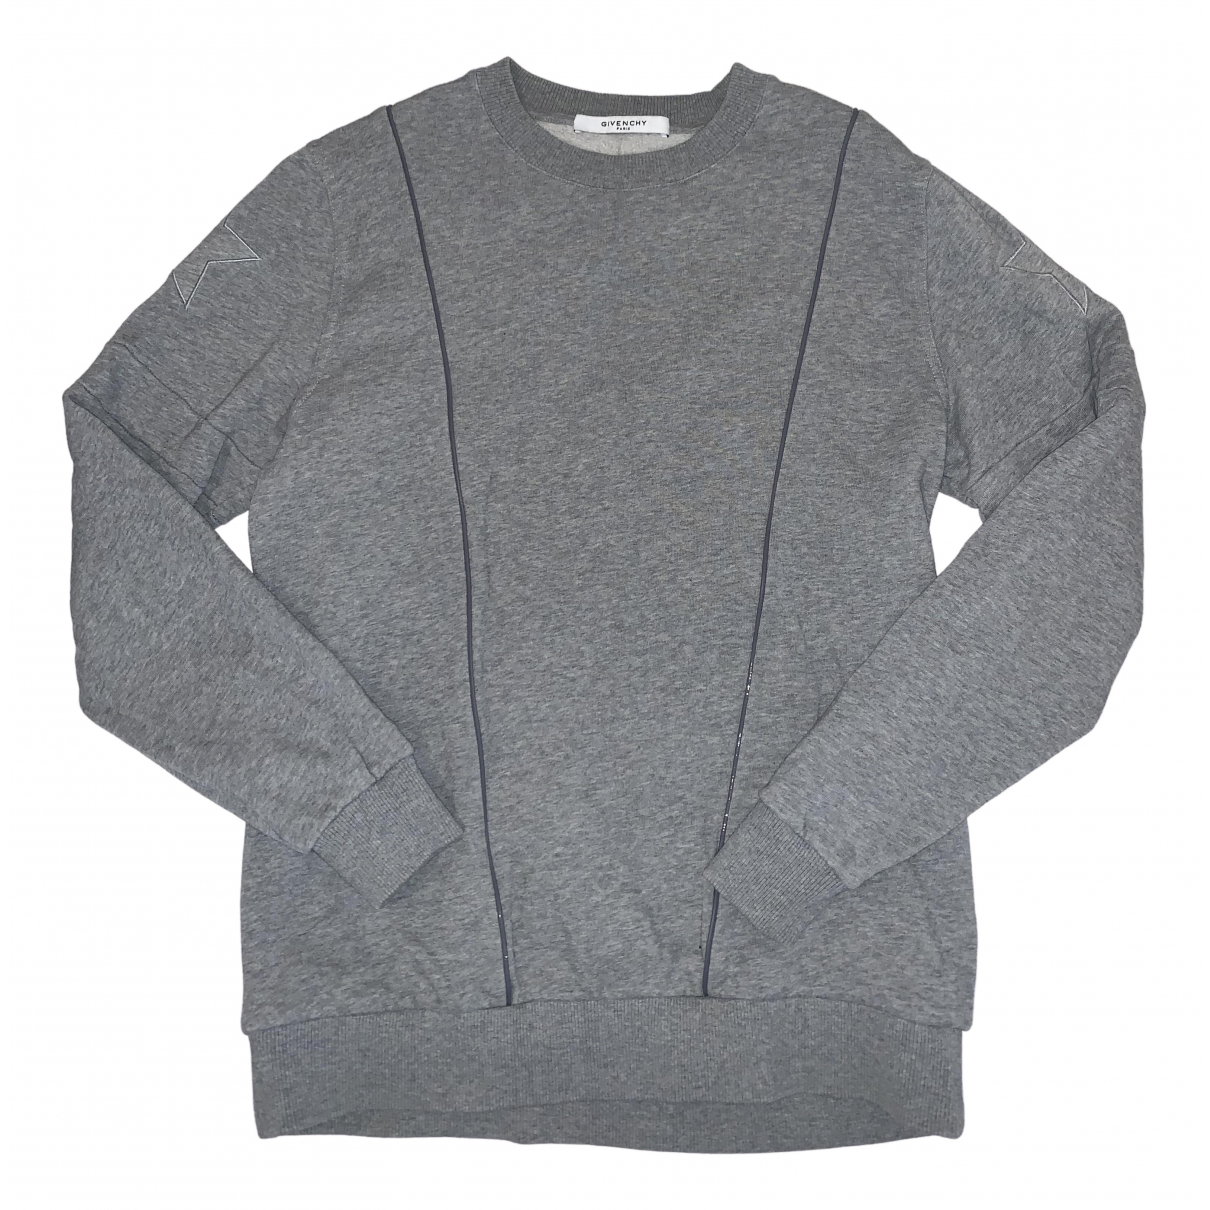 Givenchy N Grey Cotton Knitwear & Sweatshirts for Men XS International